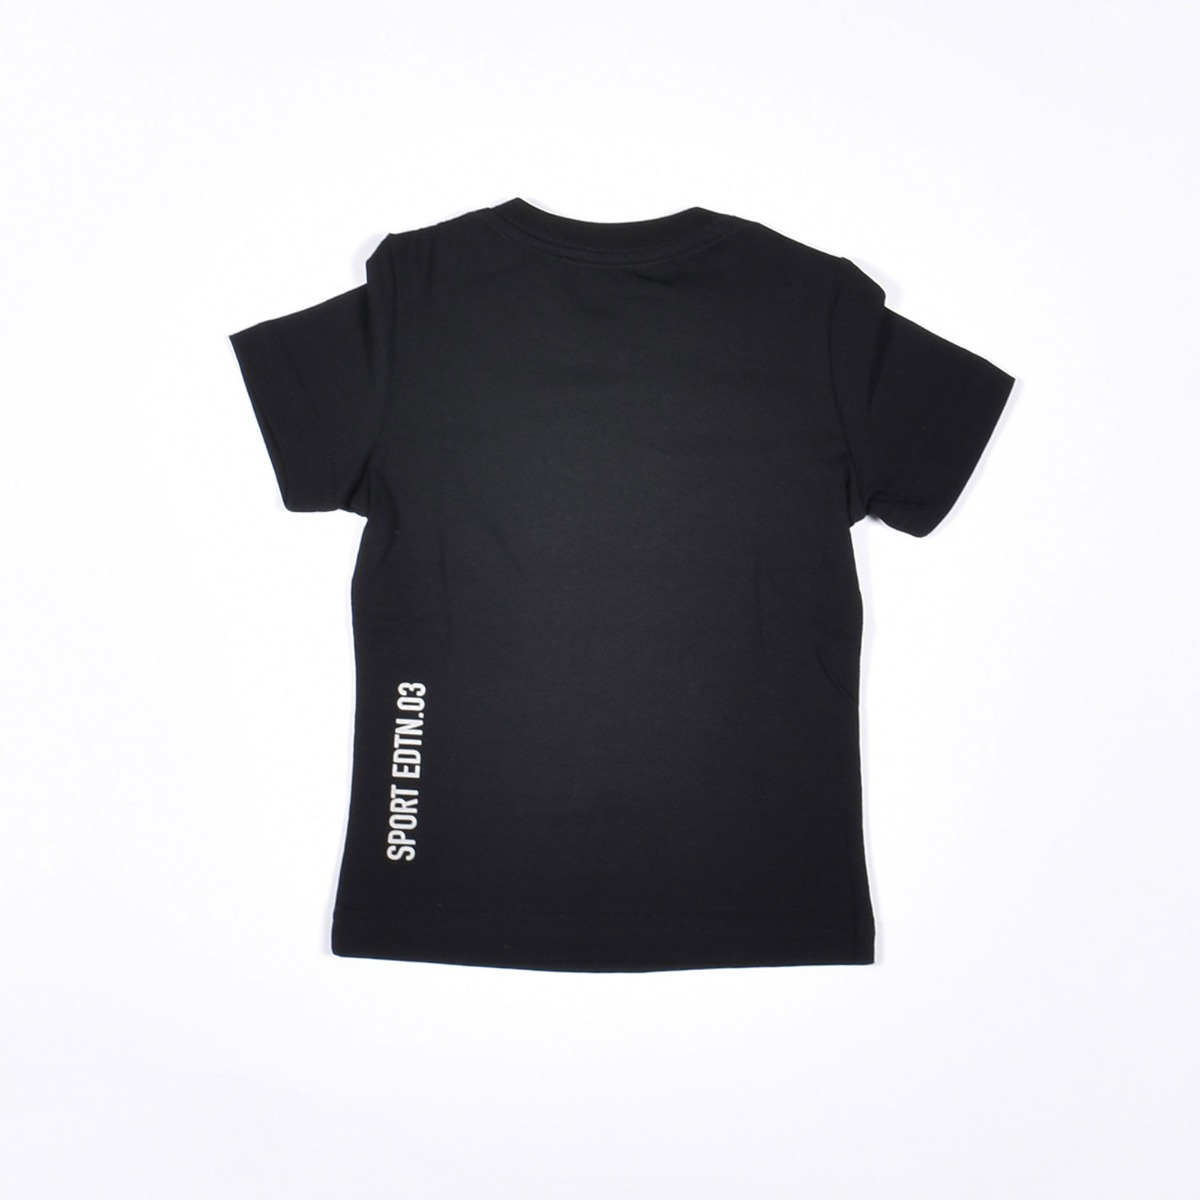 T-shirt stampa acero- Nero